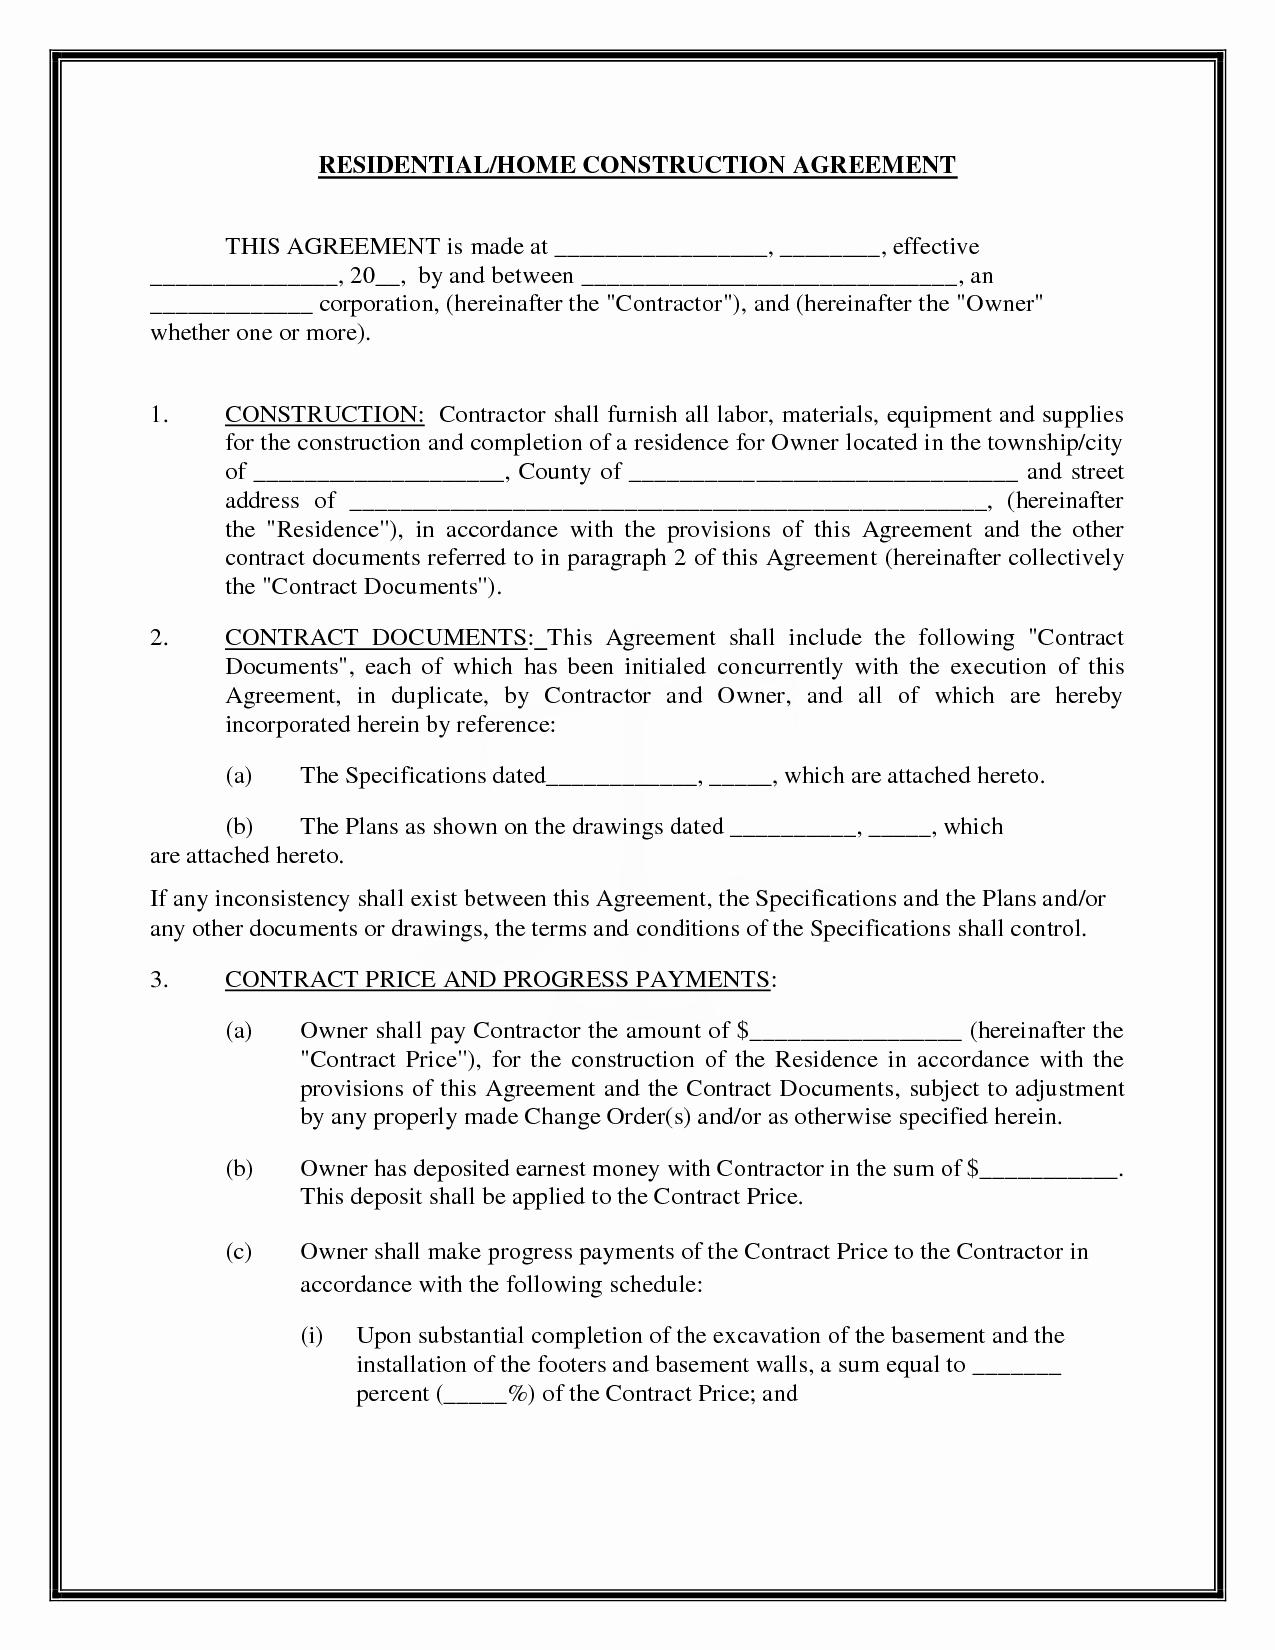 Residential Construction Contract Template Free Luxury Residential Home Construction Agreement by Readybuiltforms